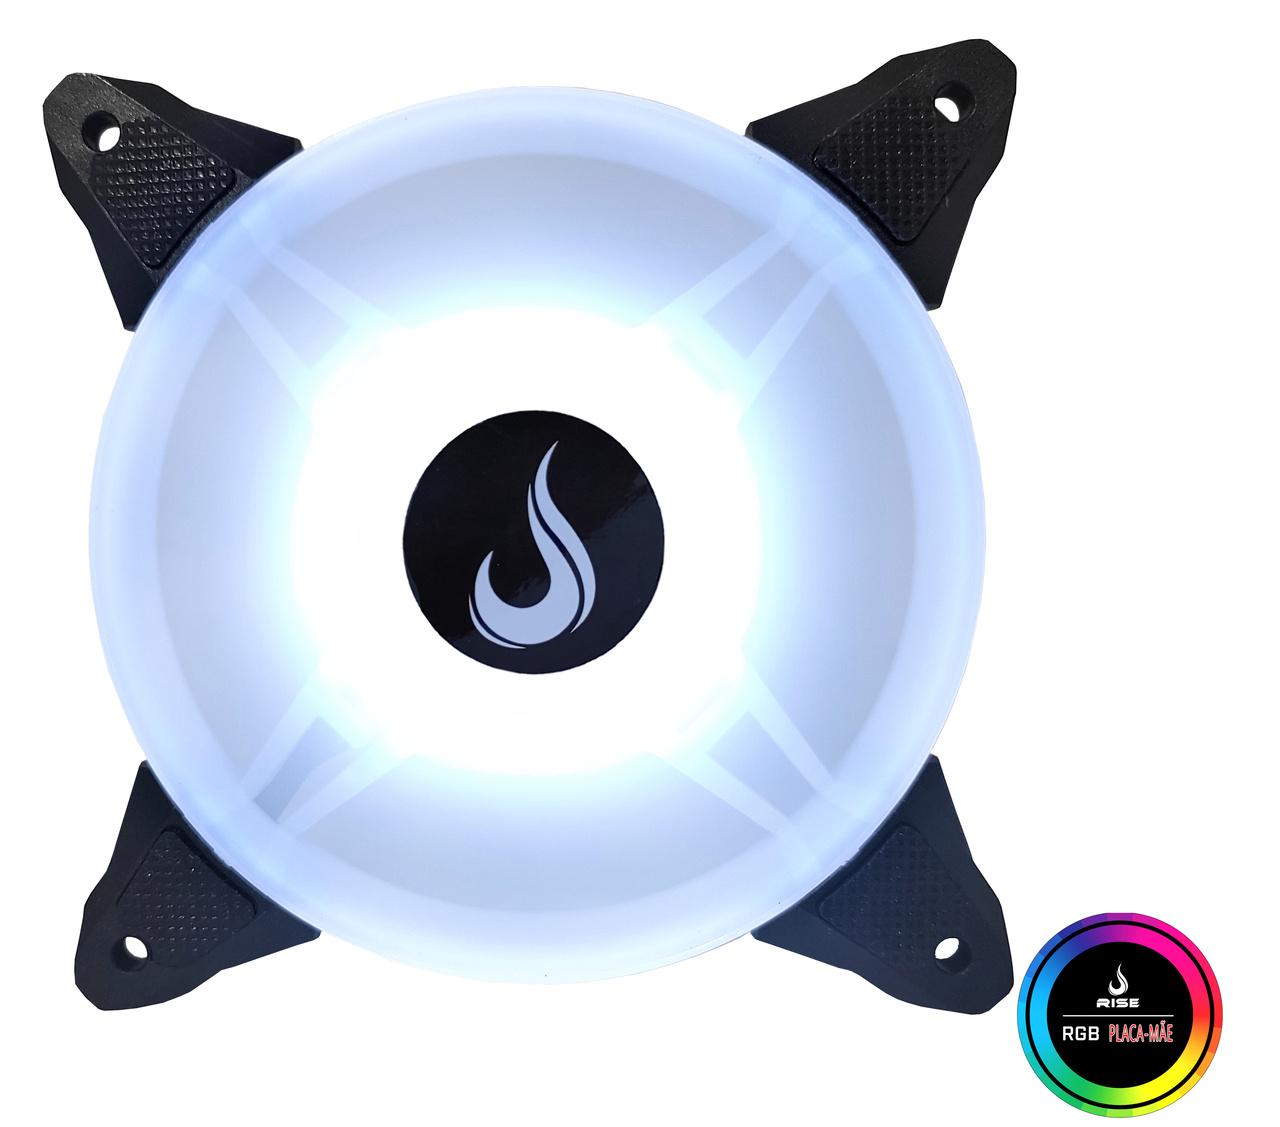 Fan Gamer Rise Mode Aqua Motherboard RGB 12V 120mm